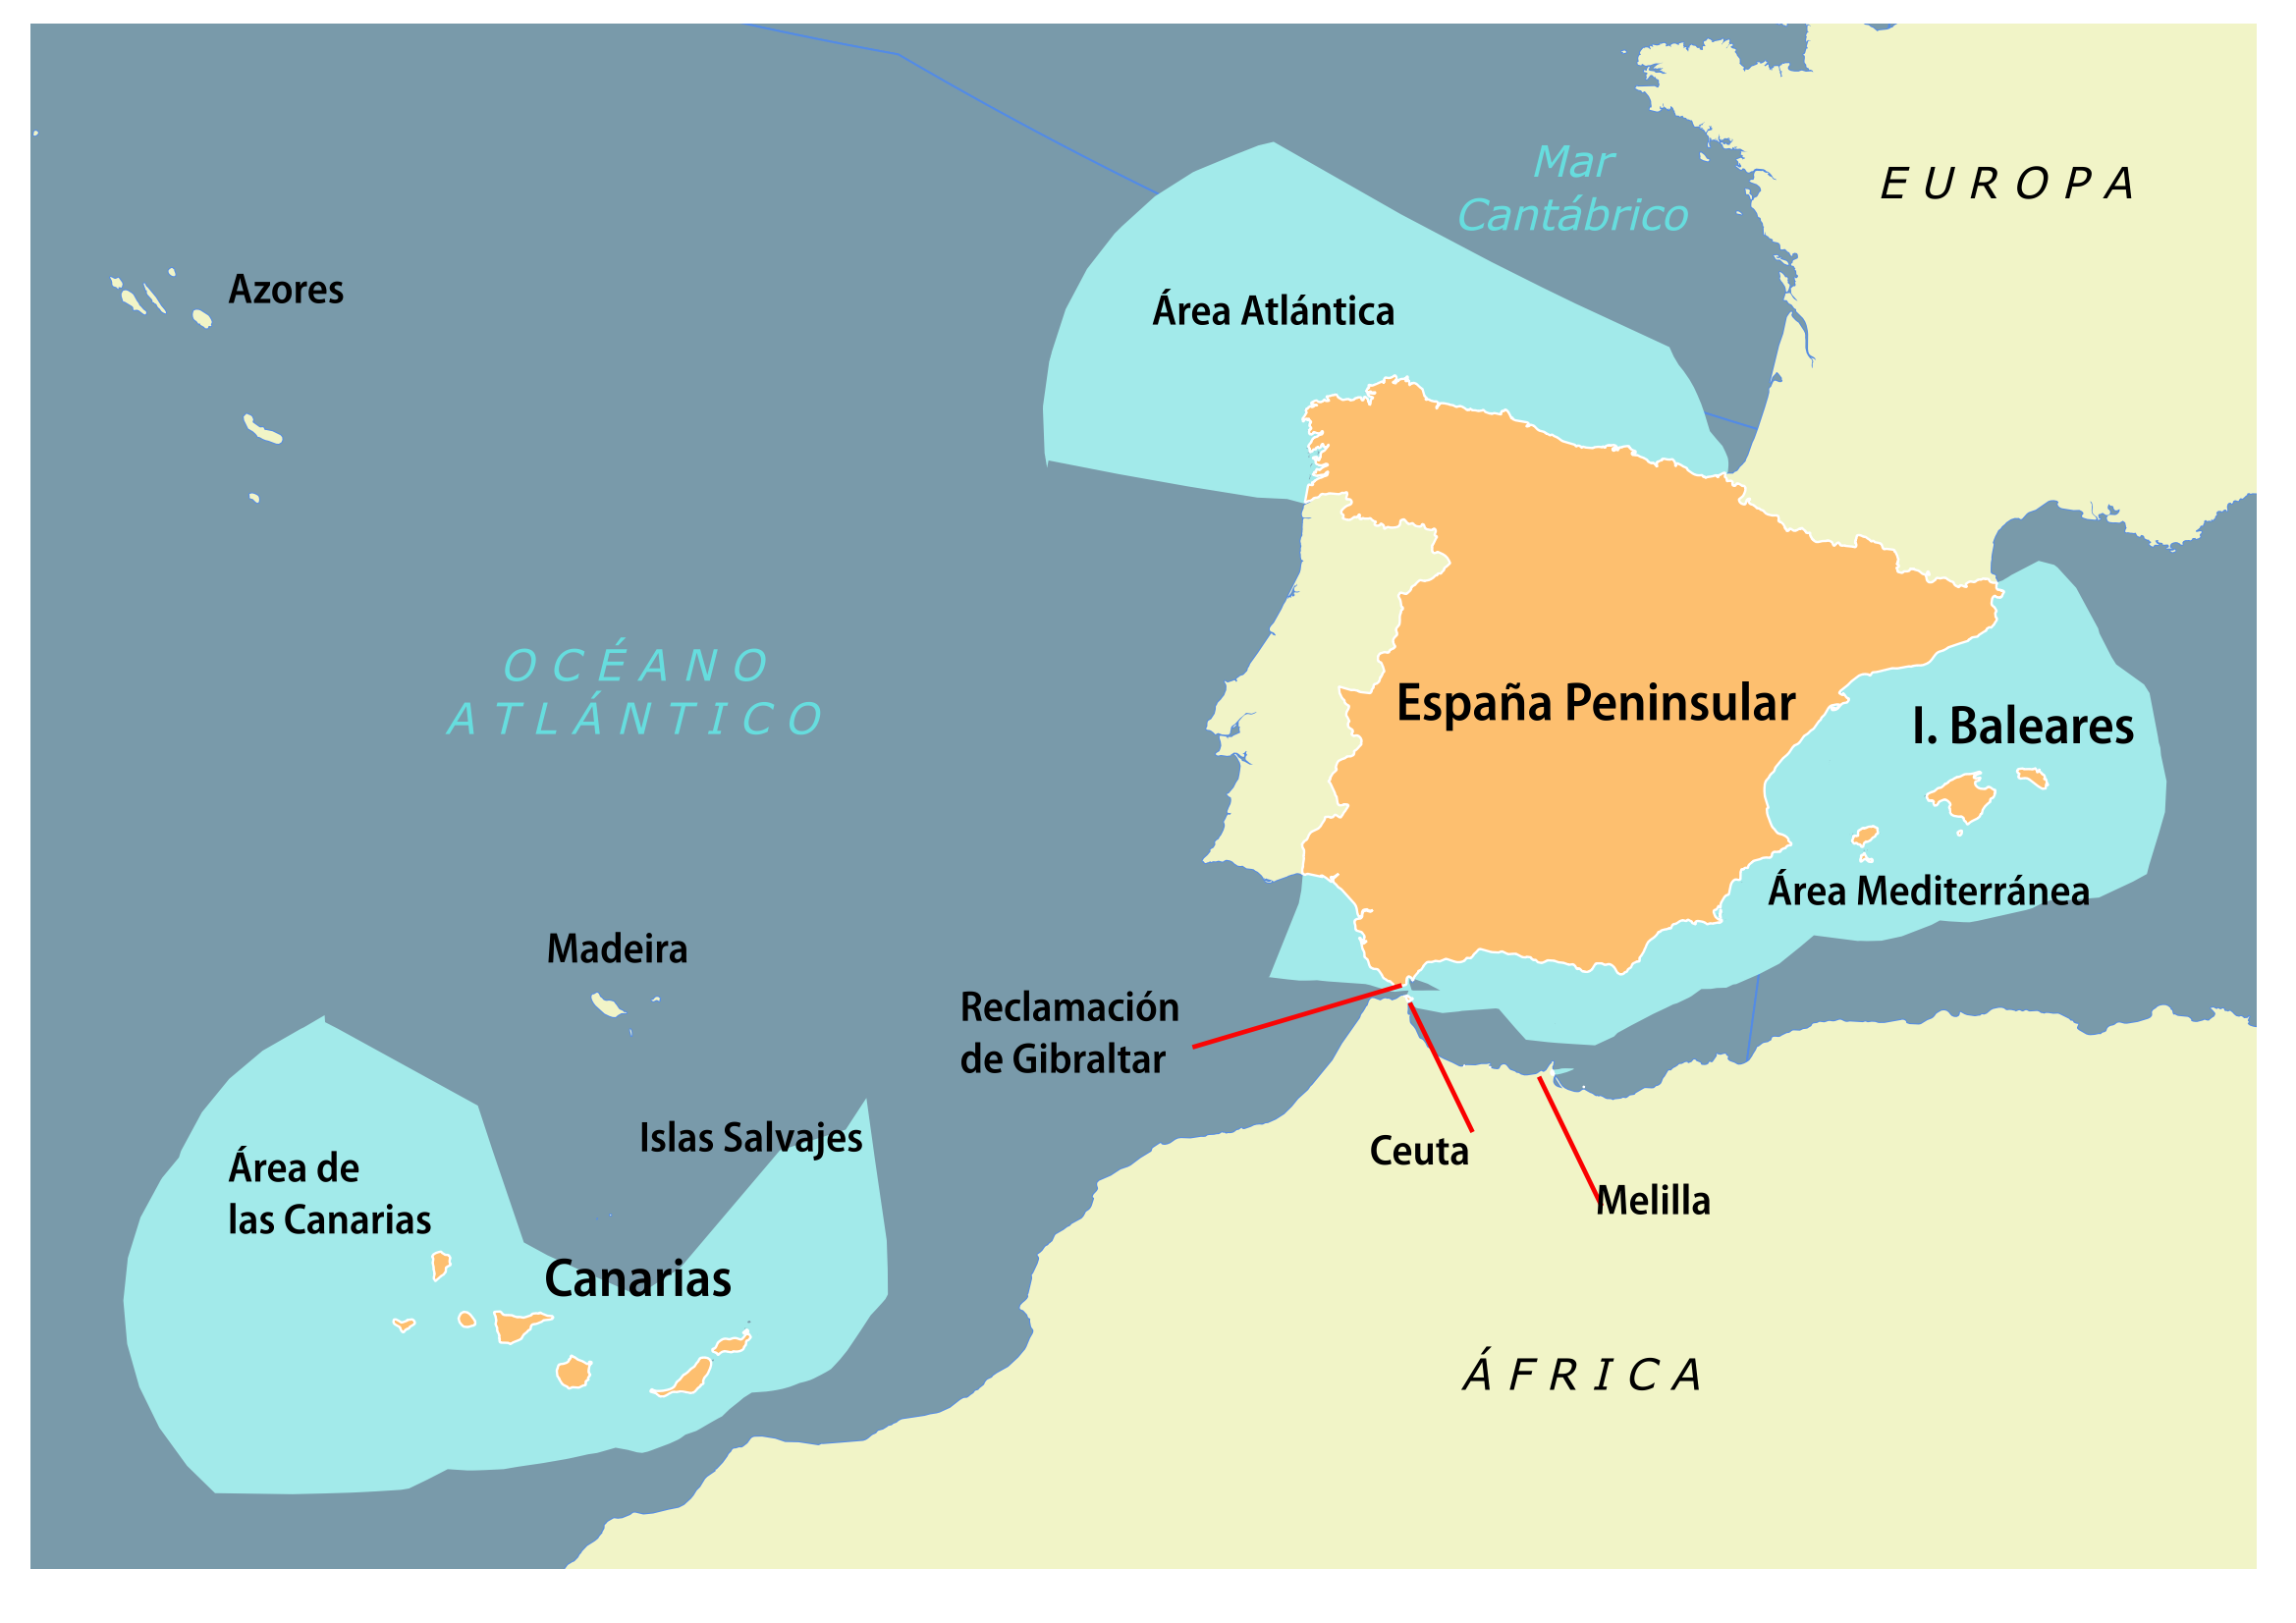 Aguas Territoriales Españolas Mapa.Zona Economica Exclusiva De Espana Wikipedia La